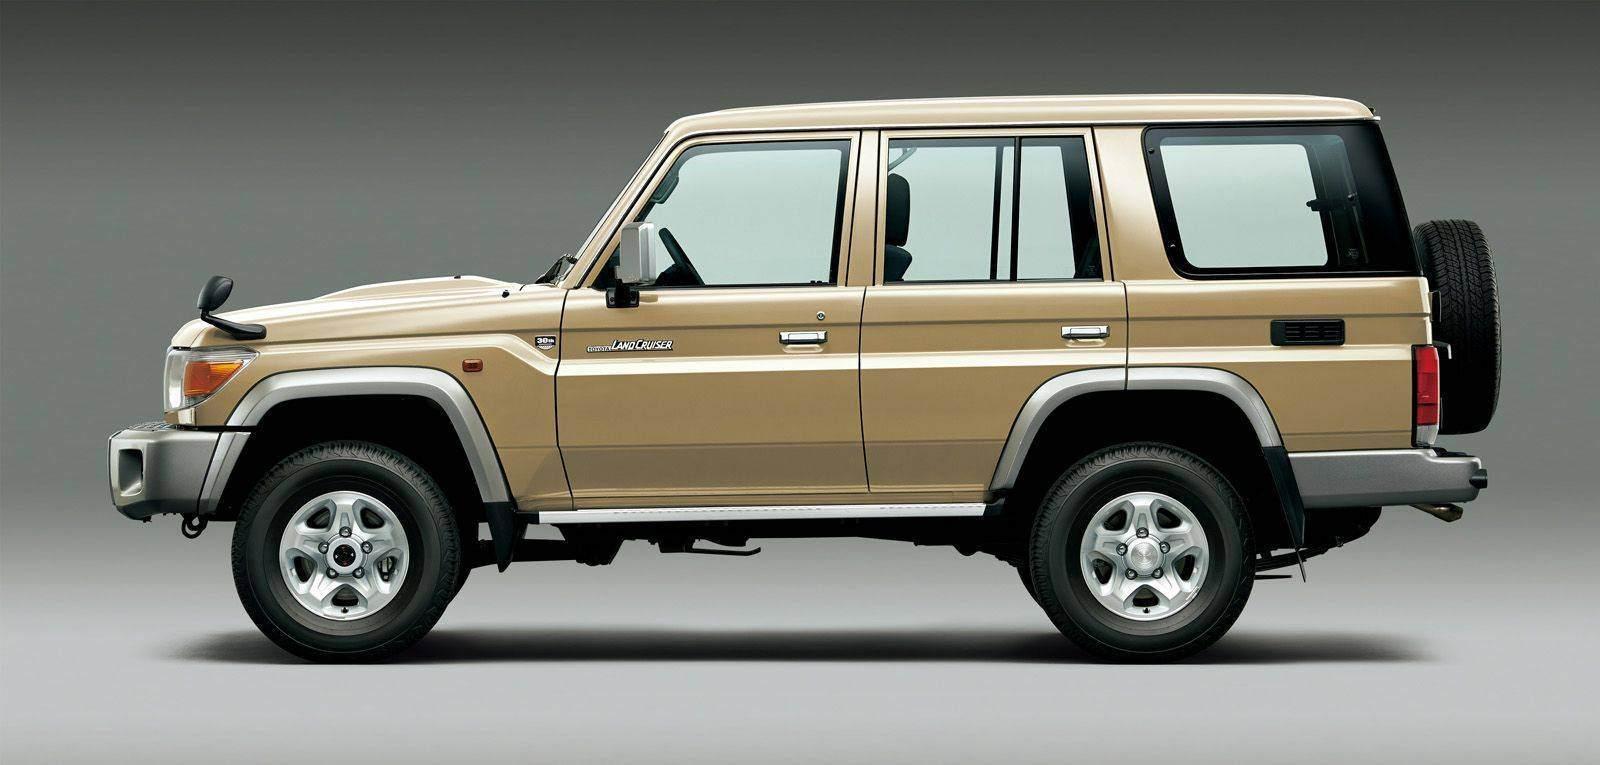 Toyota-Land-Cruiser-70-Series-2